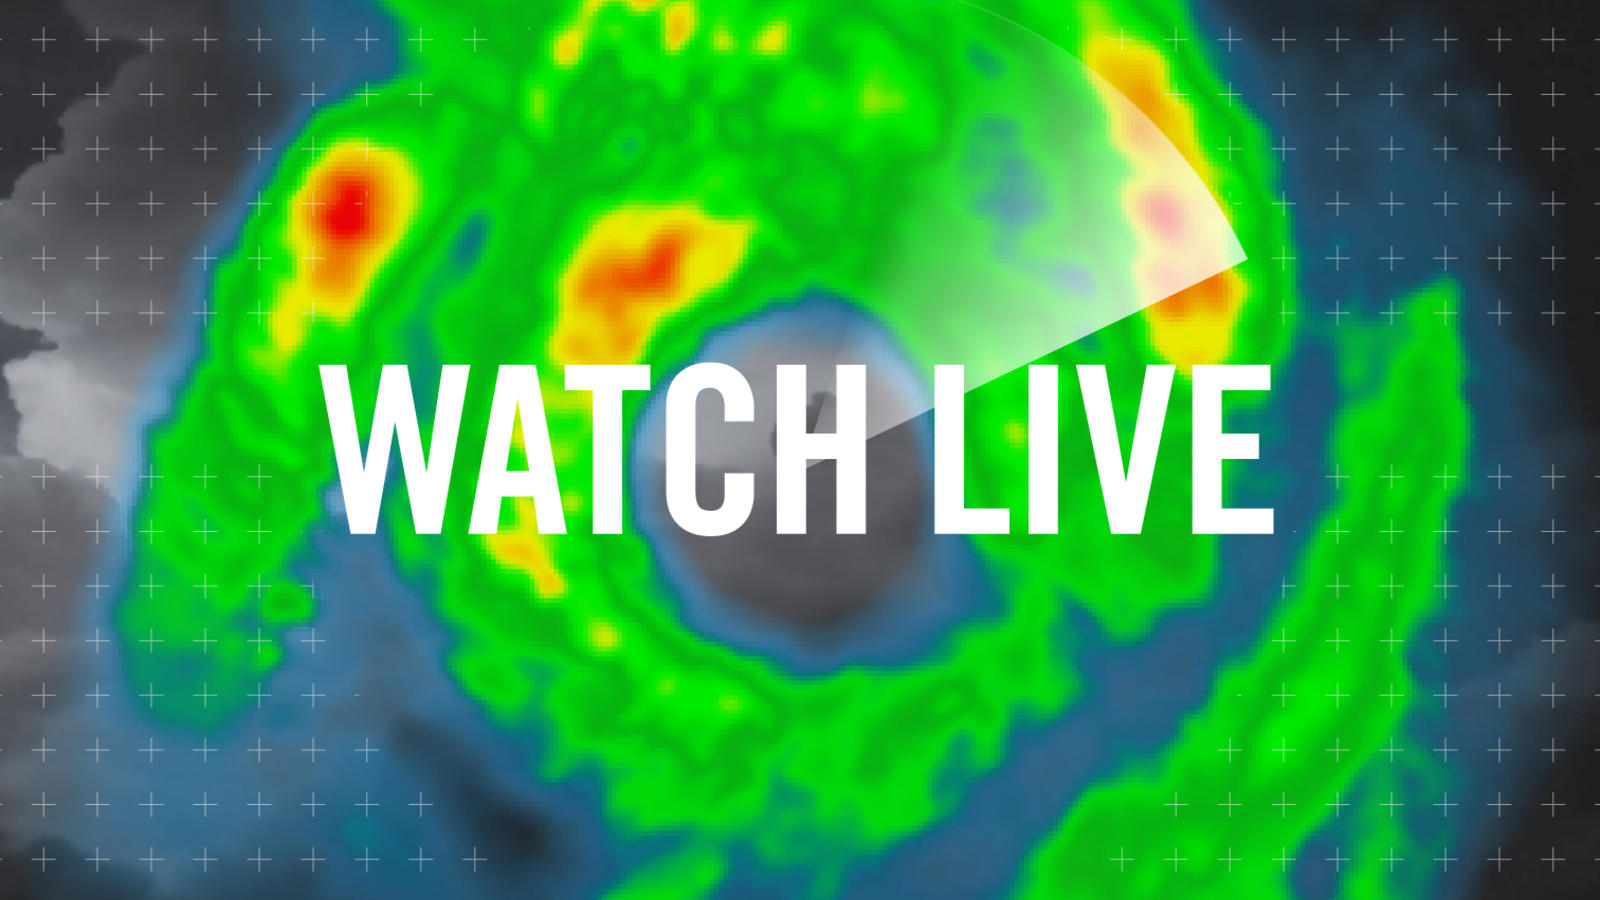 kd_7_watch_live